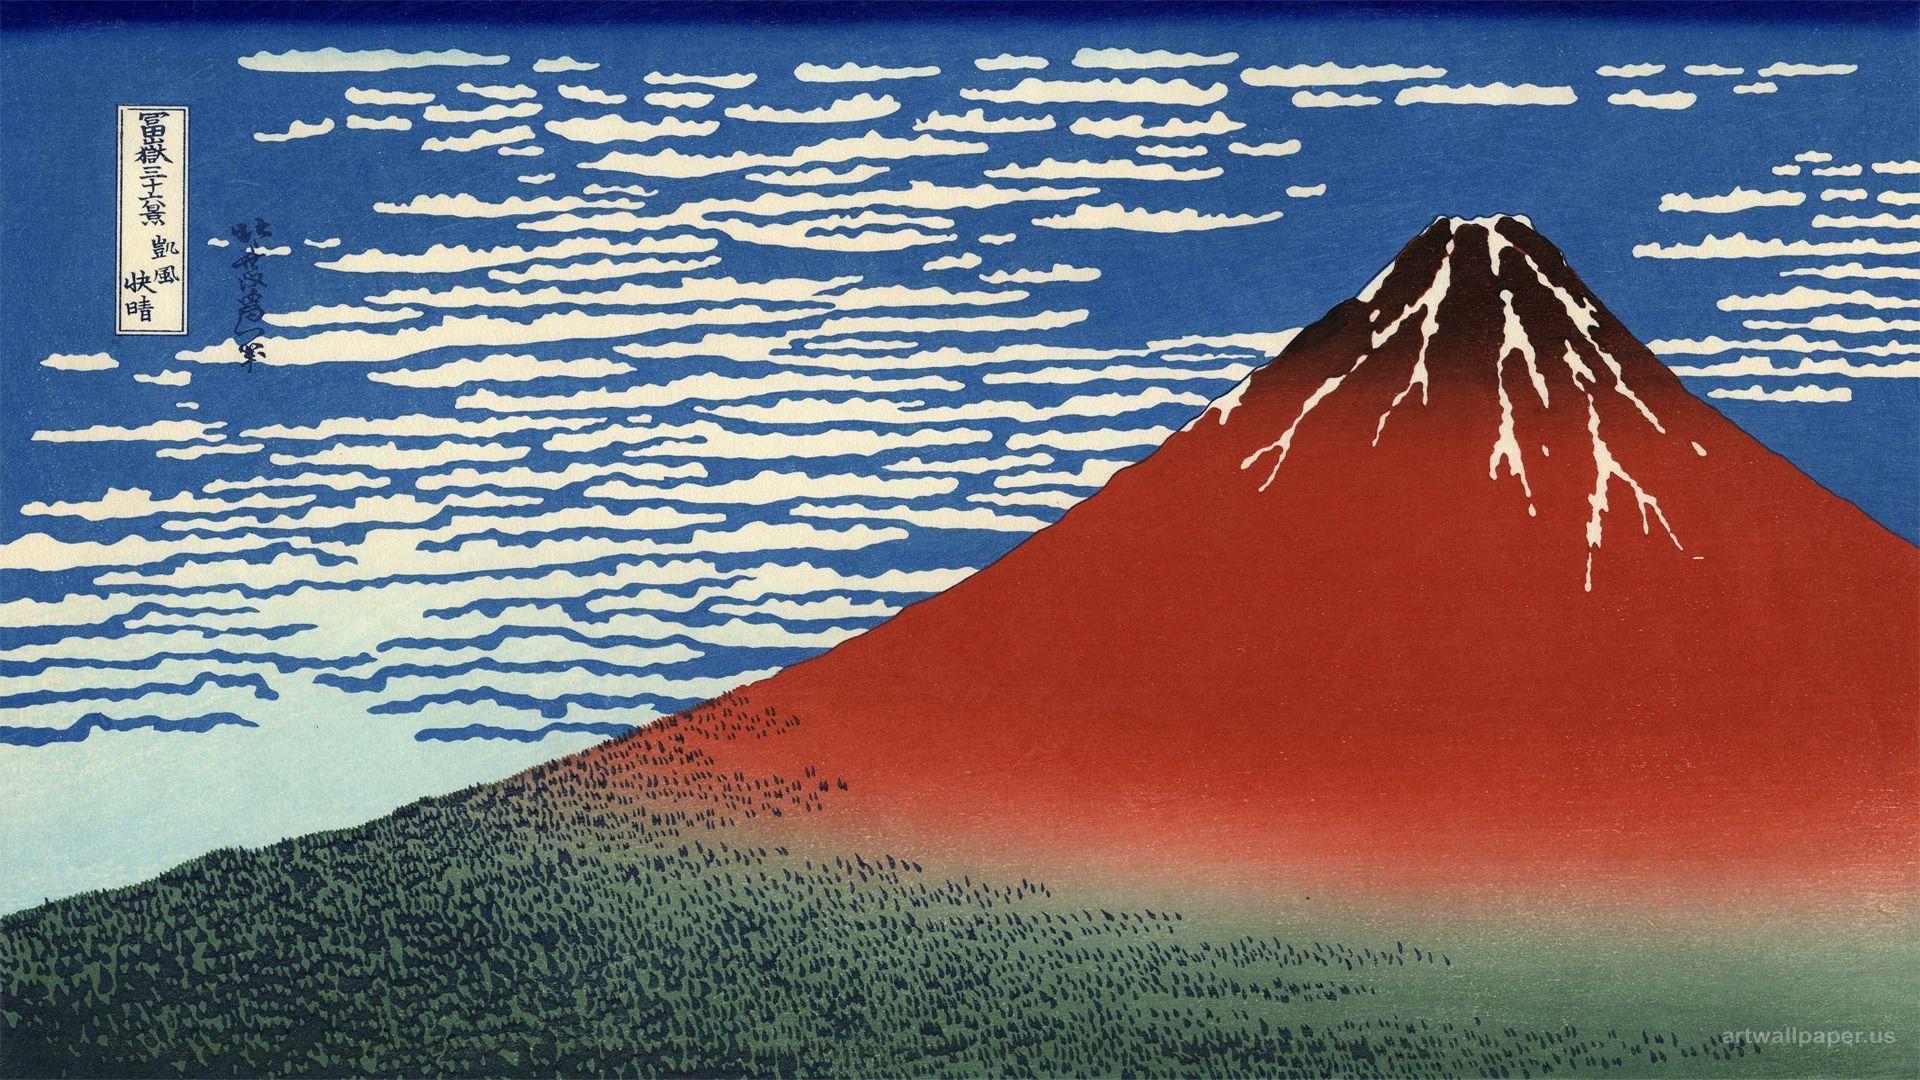 japan japanese wallpaper 1920x1080 - photo #47